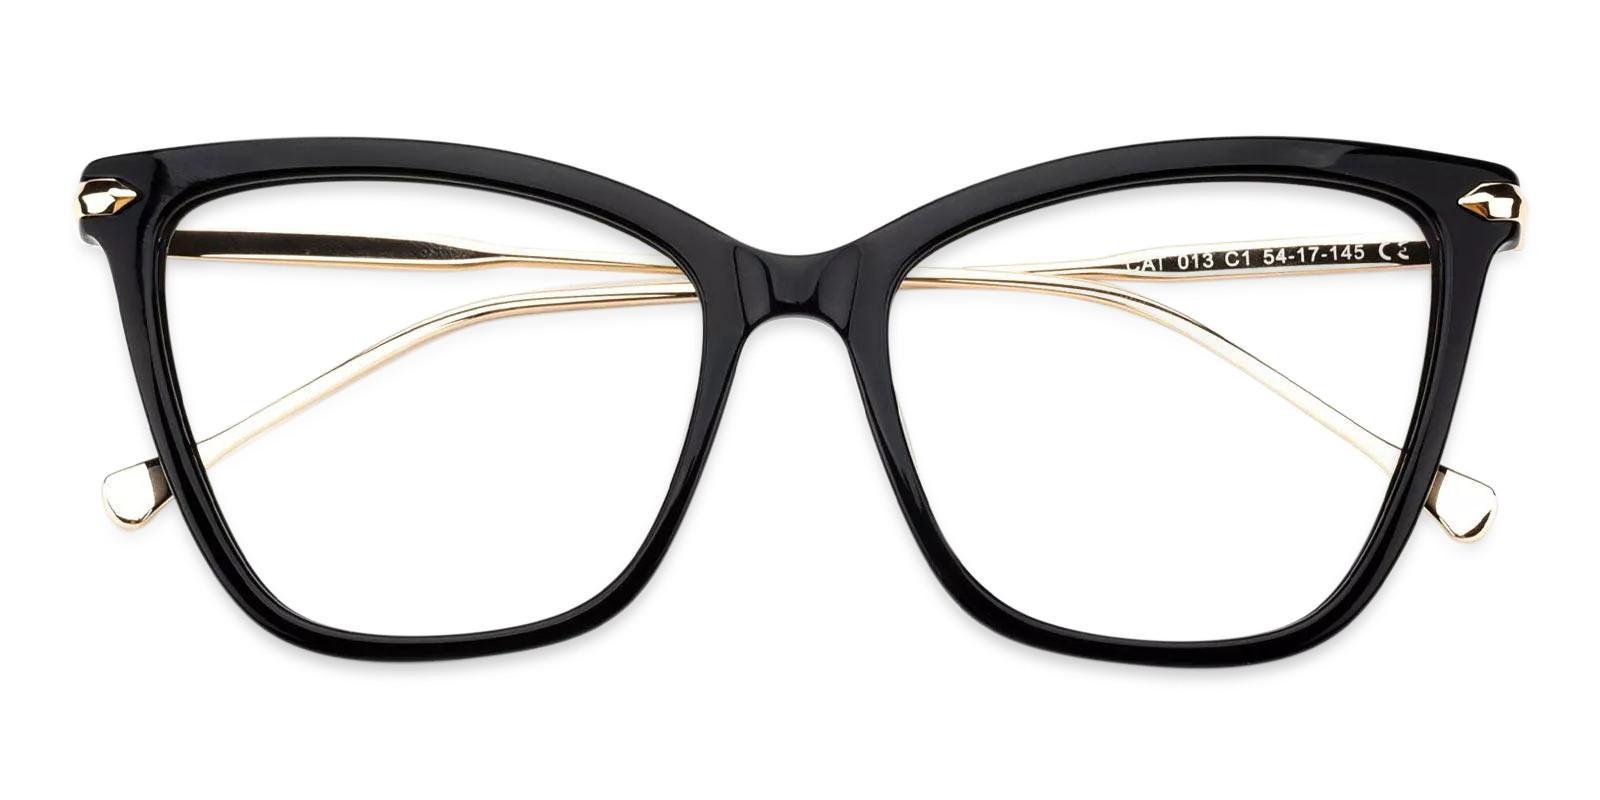 Gosse Black Acetate , Metal Eyeglasses , Fashion , UniversalBridgeFit Frames from ABBE Glasses